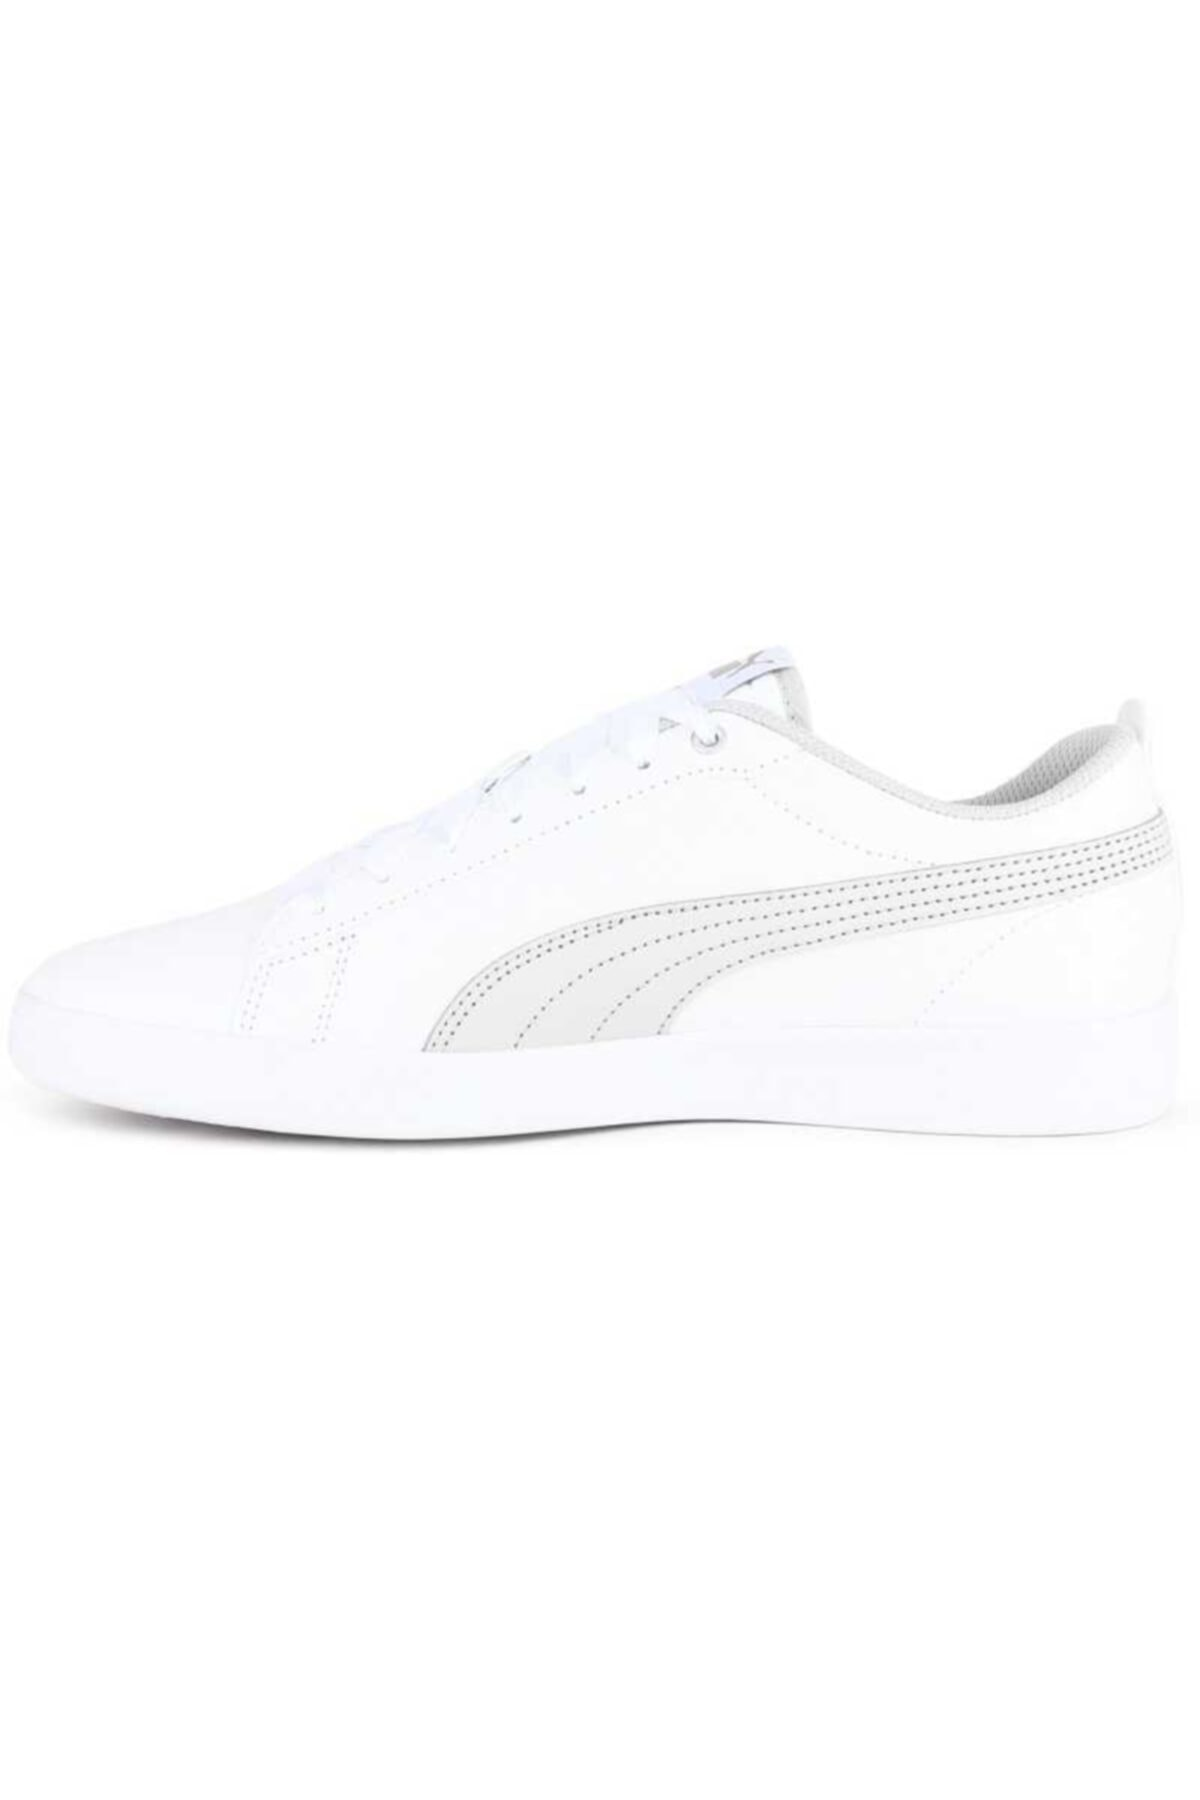 Puma Smash V2 L Unisex Günlük Ayakkabı - 36521524 2